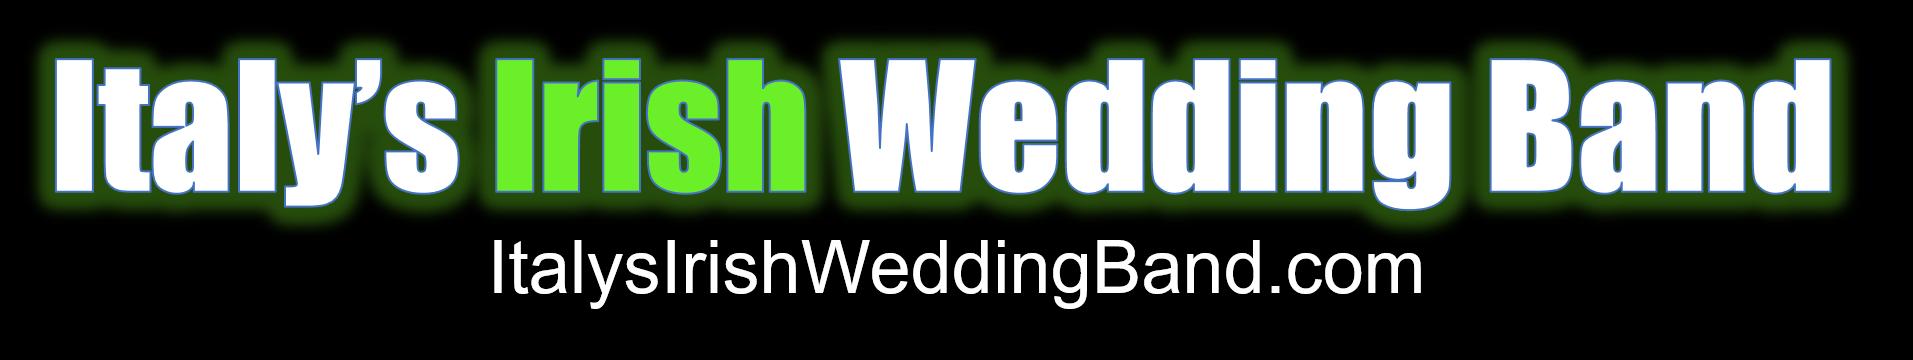 Italy's Irish Wedding Band banner logo